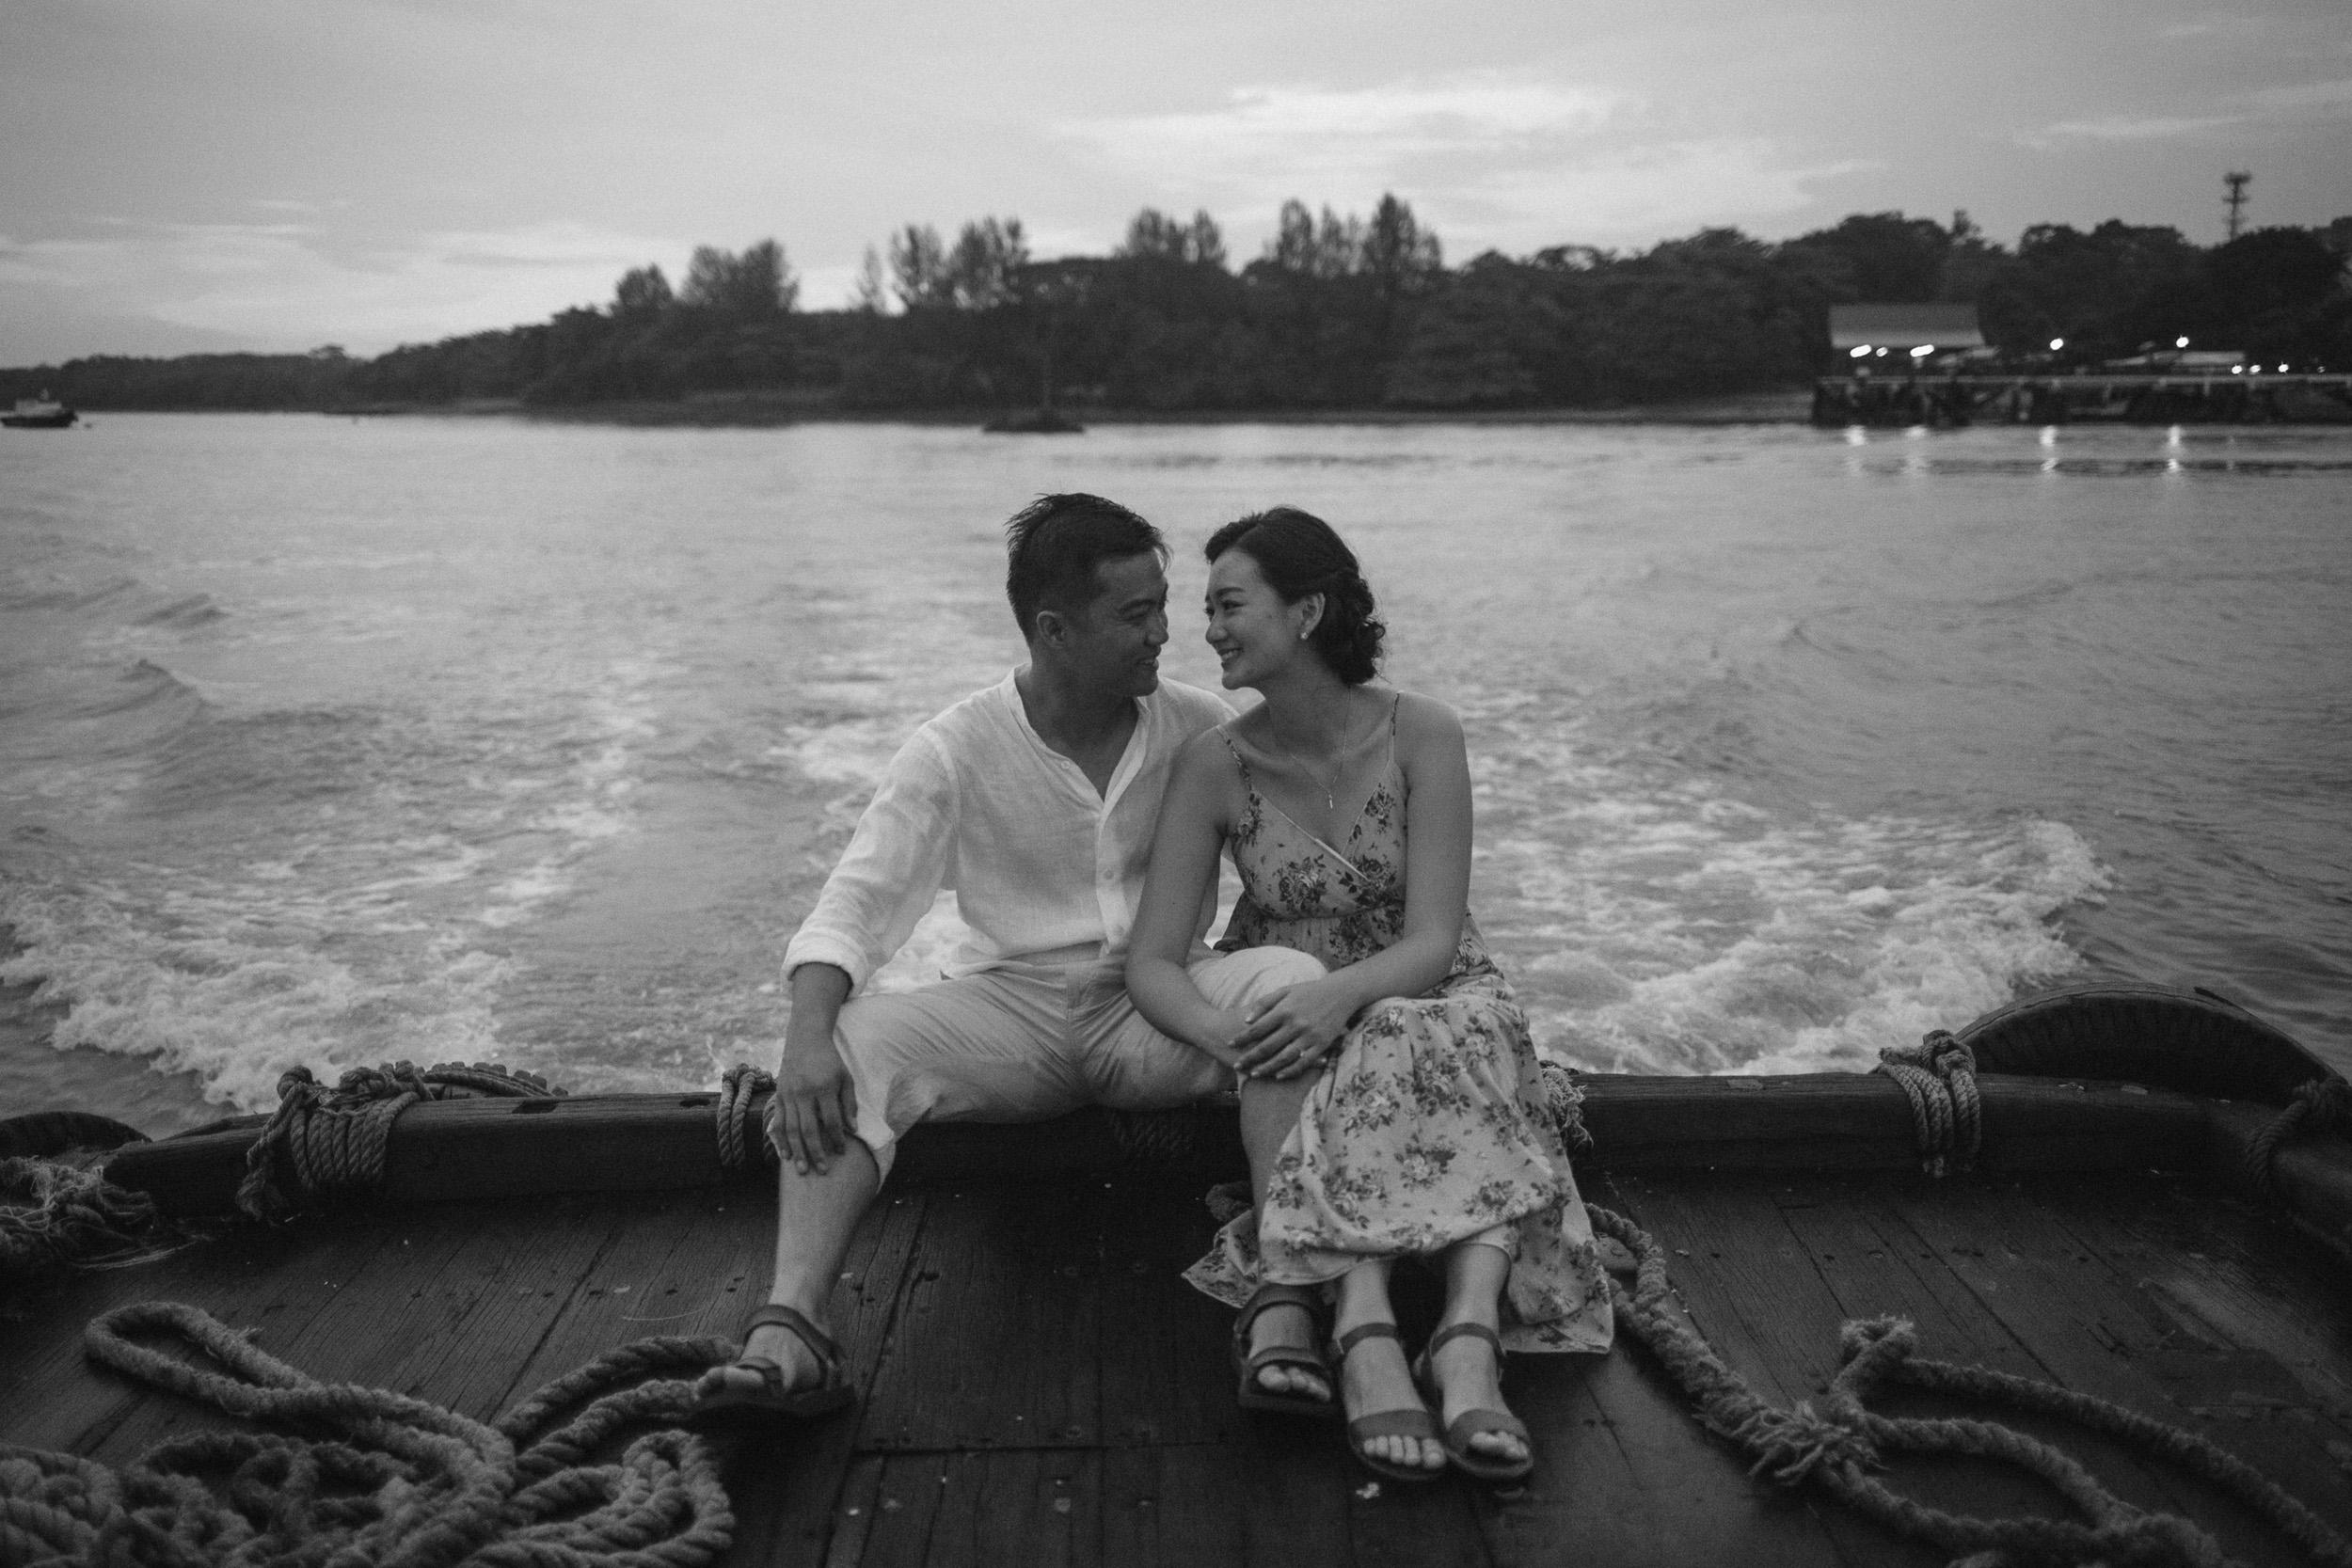 singapore-wedding-photographer-photography-wmt2017-129.jpg